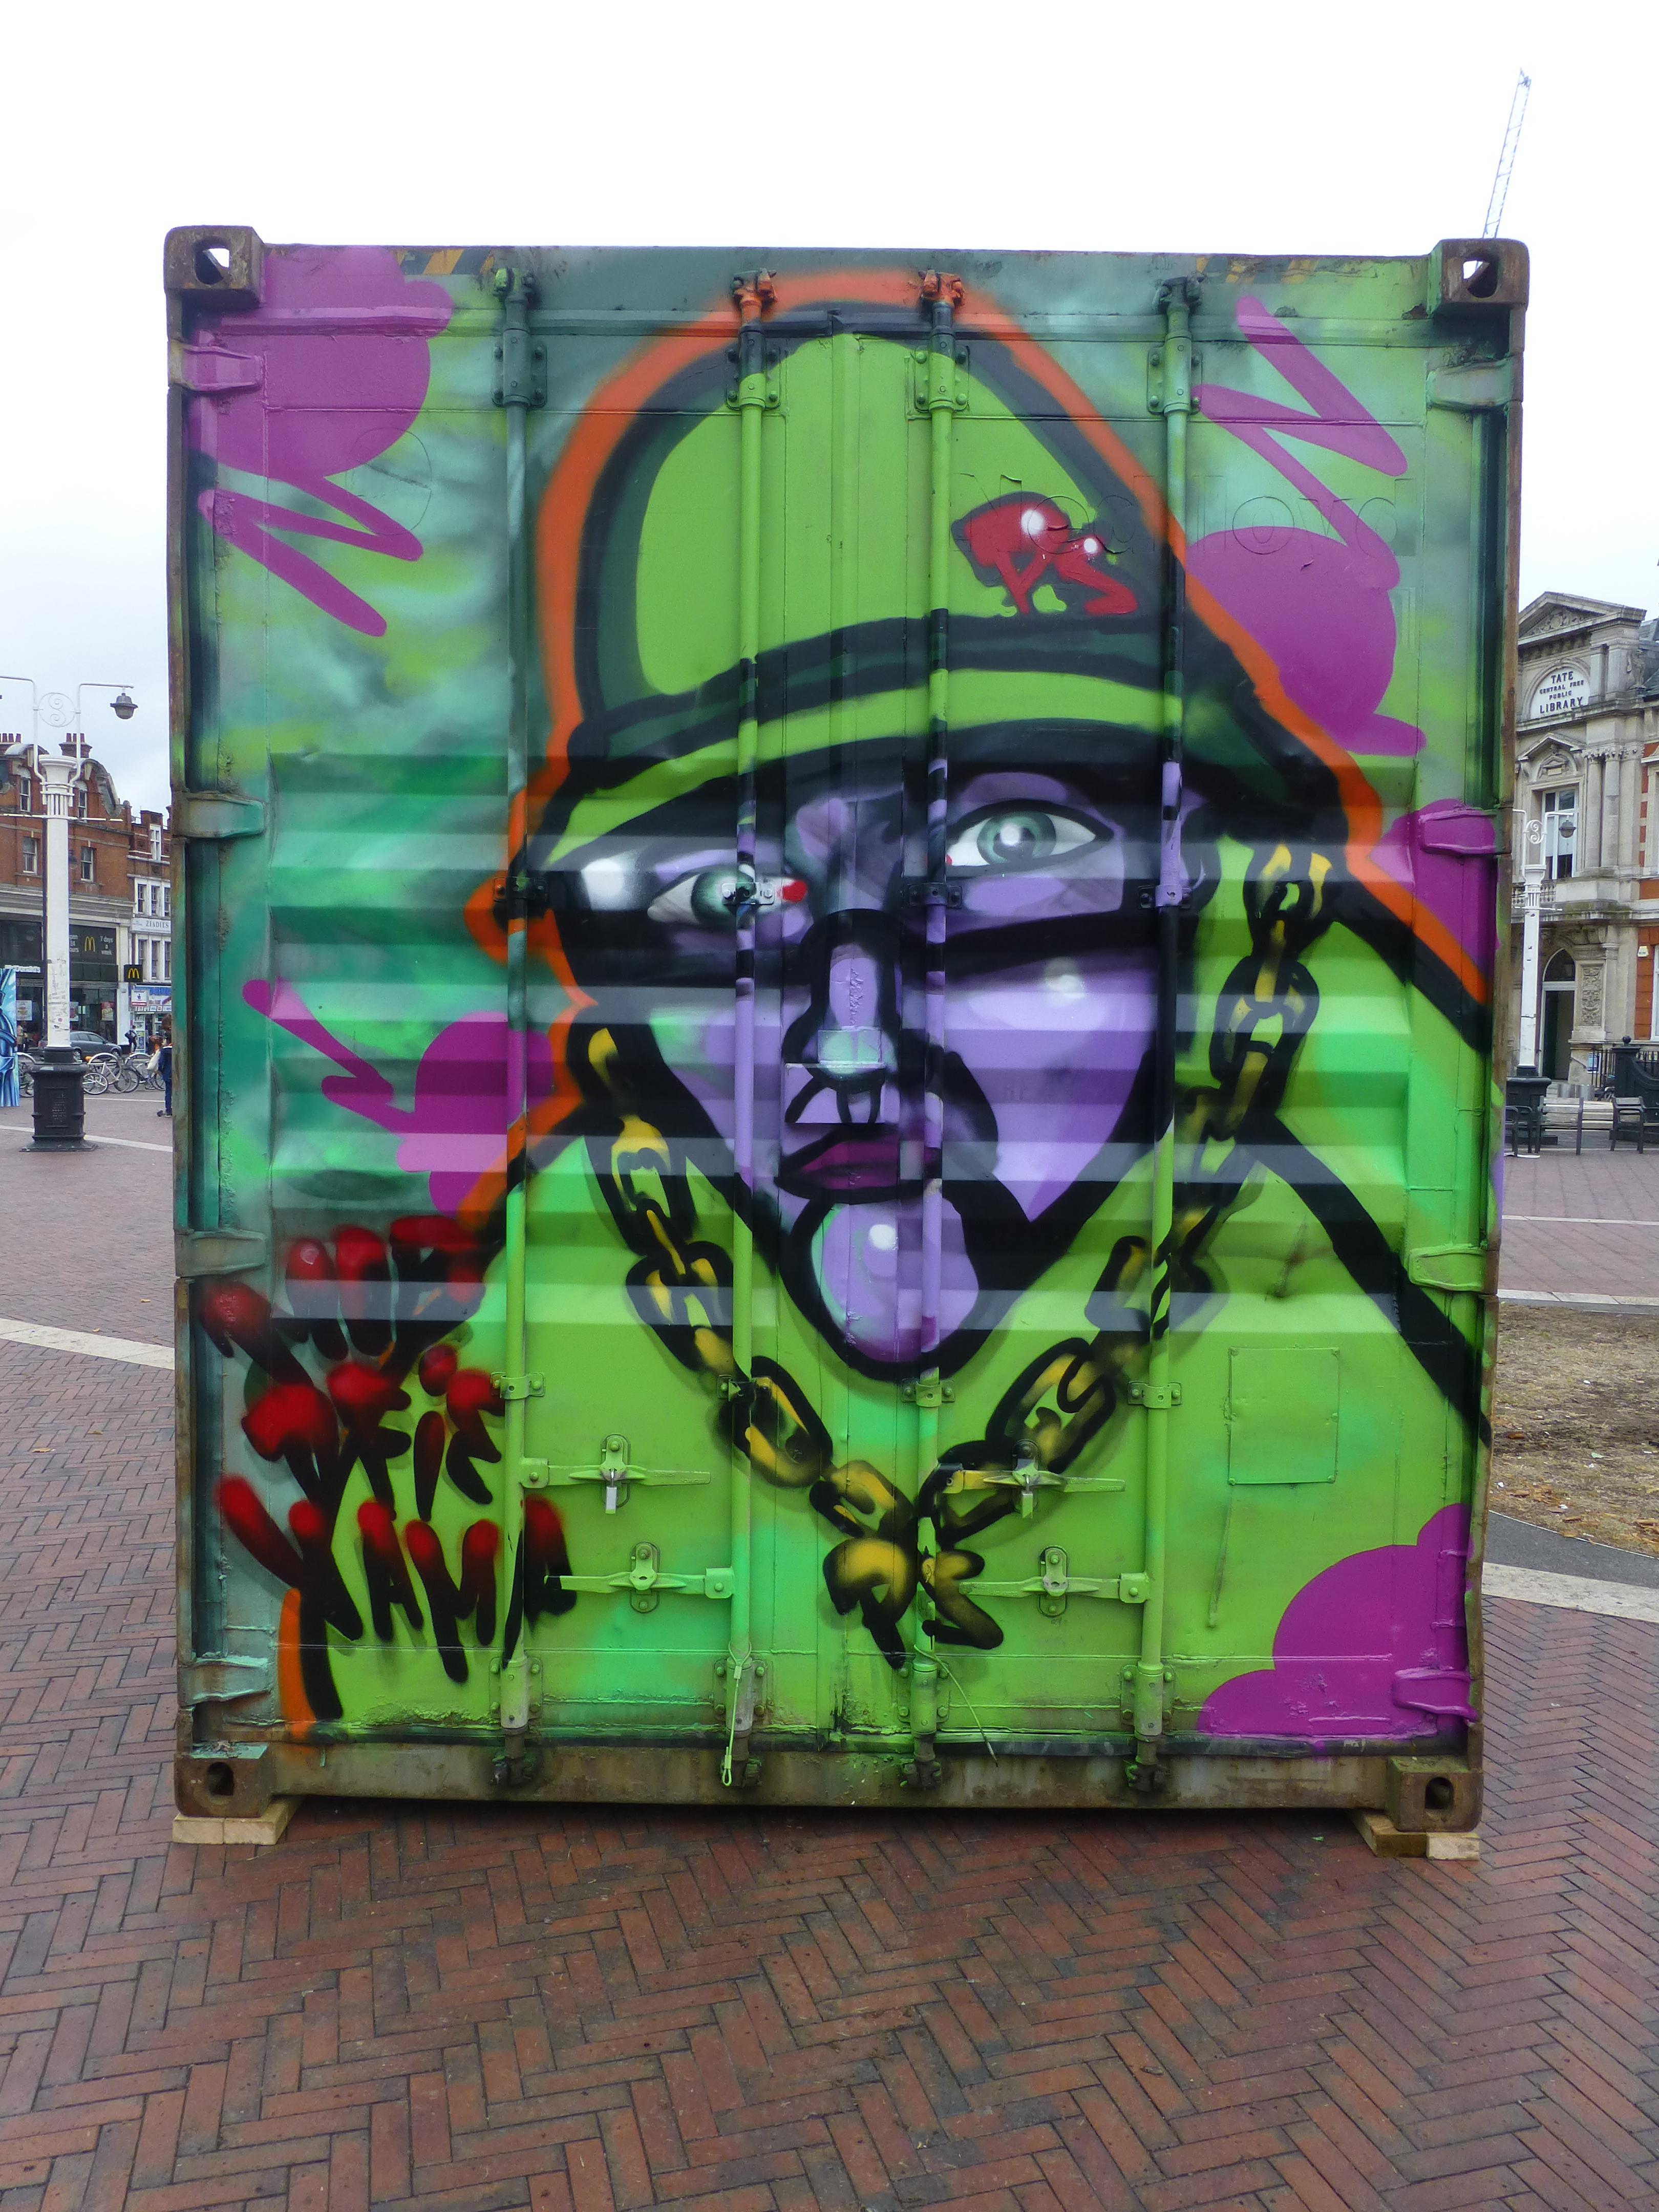 Street art graffiti of urban art brixton 2015 london calling blog p1220676 altavistaventures Images